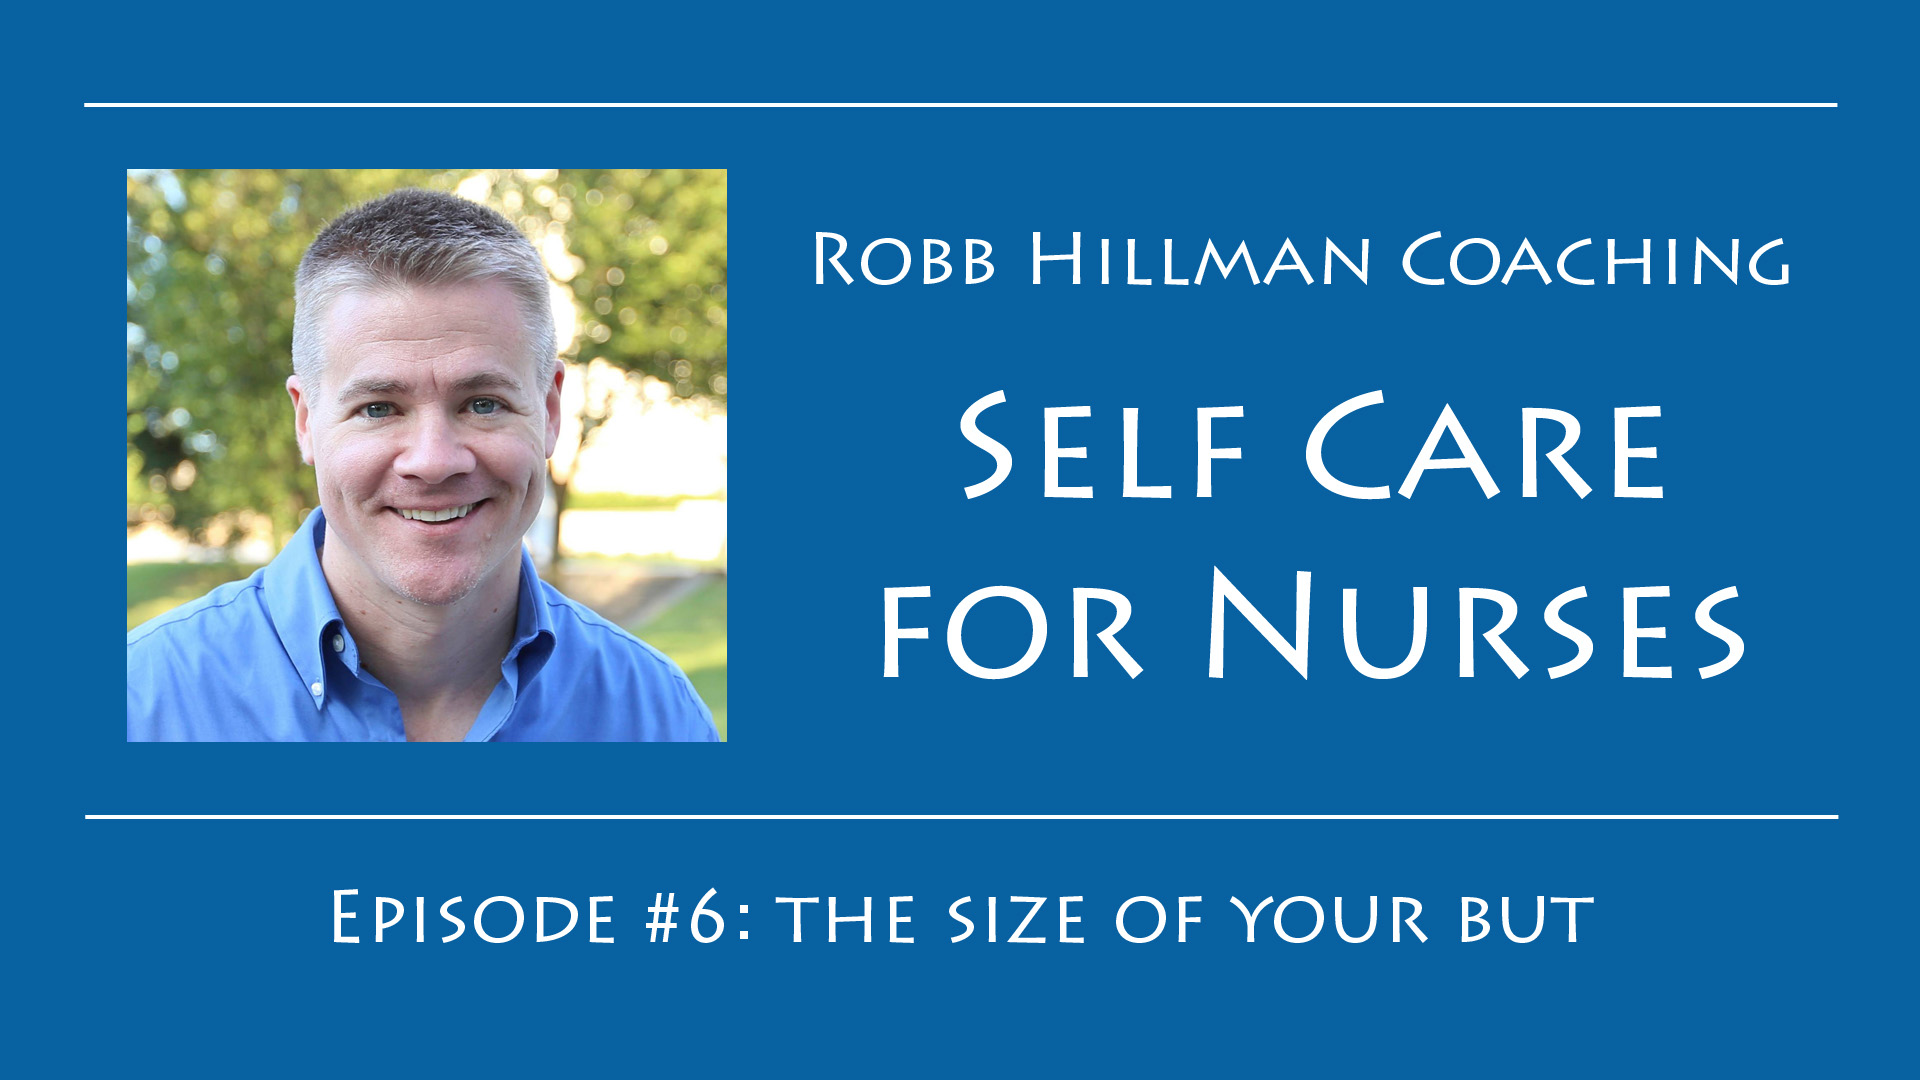 Self Care for Nurses Episode 6